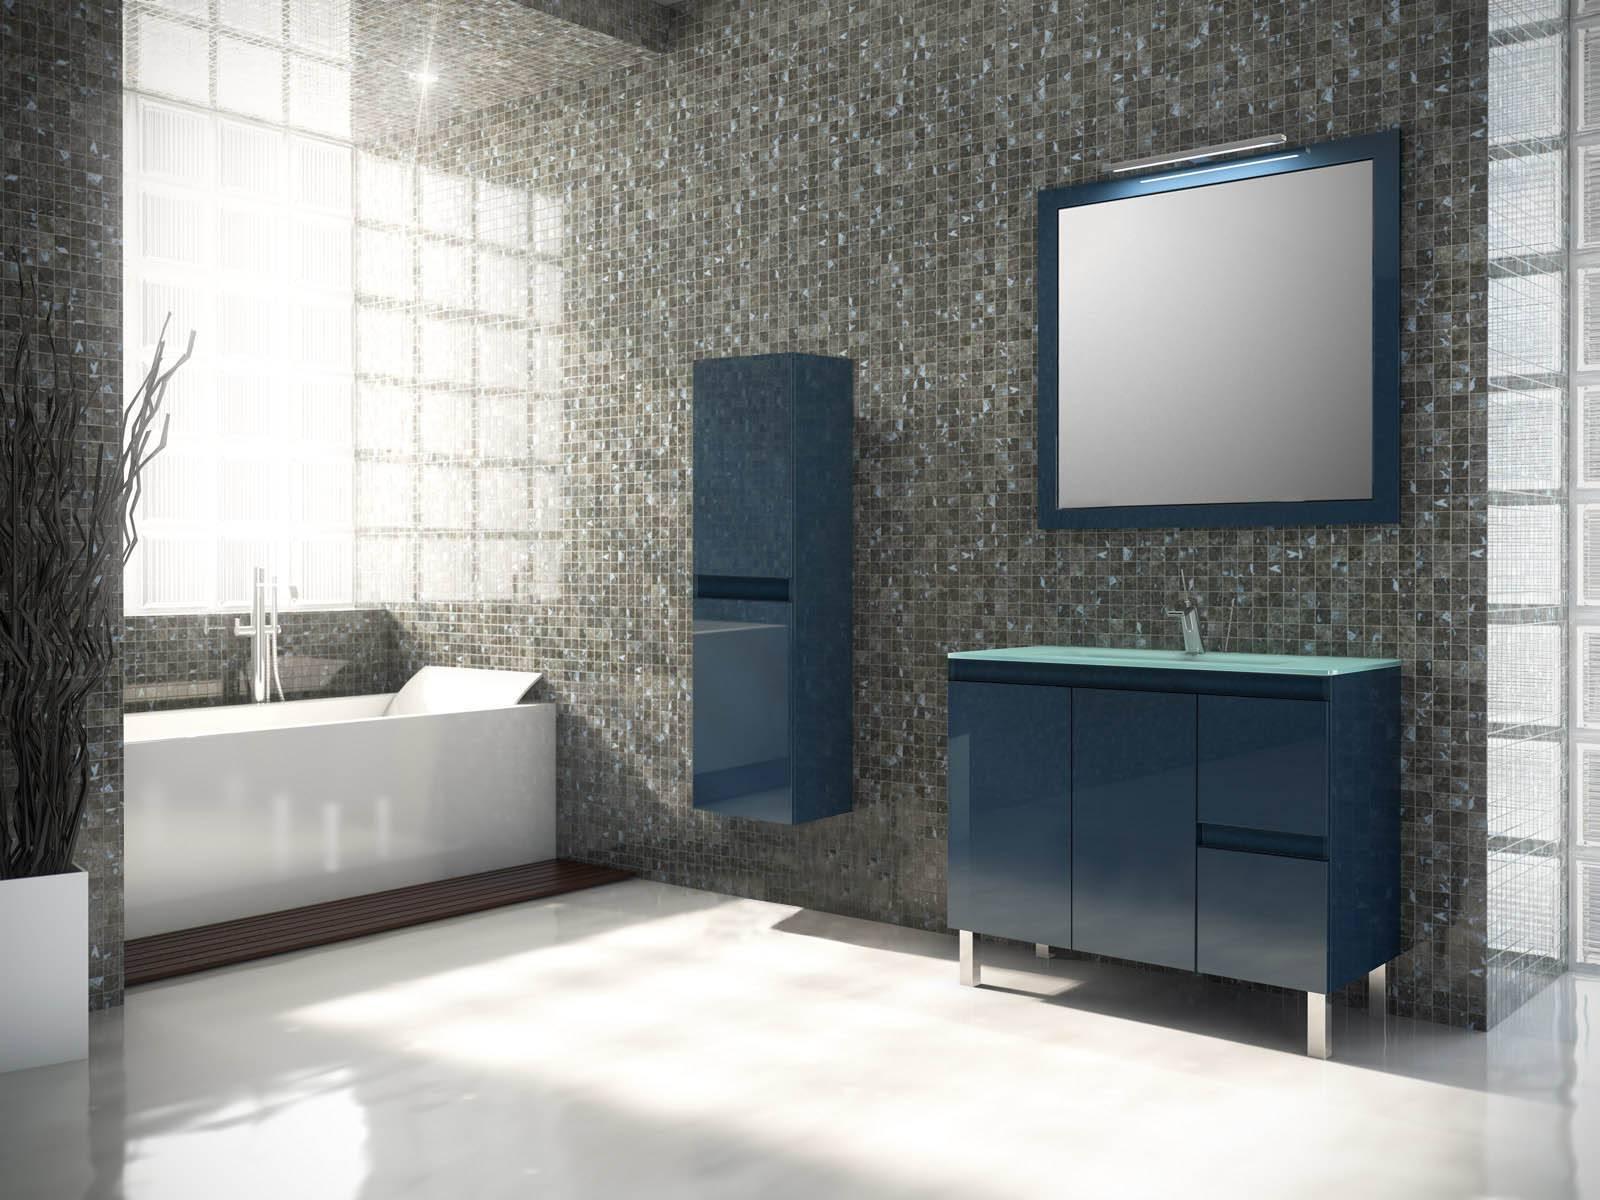 Conjunto mueble de ba o sparta muebles de ba o baratos 429 for Conjunto accesorios bano baratos